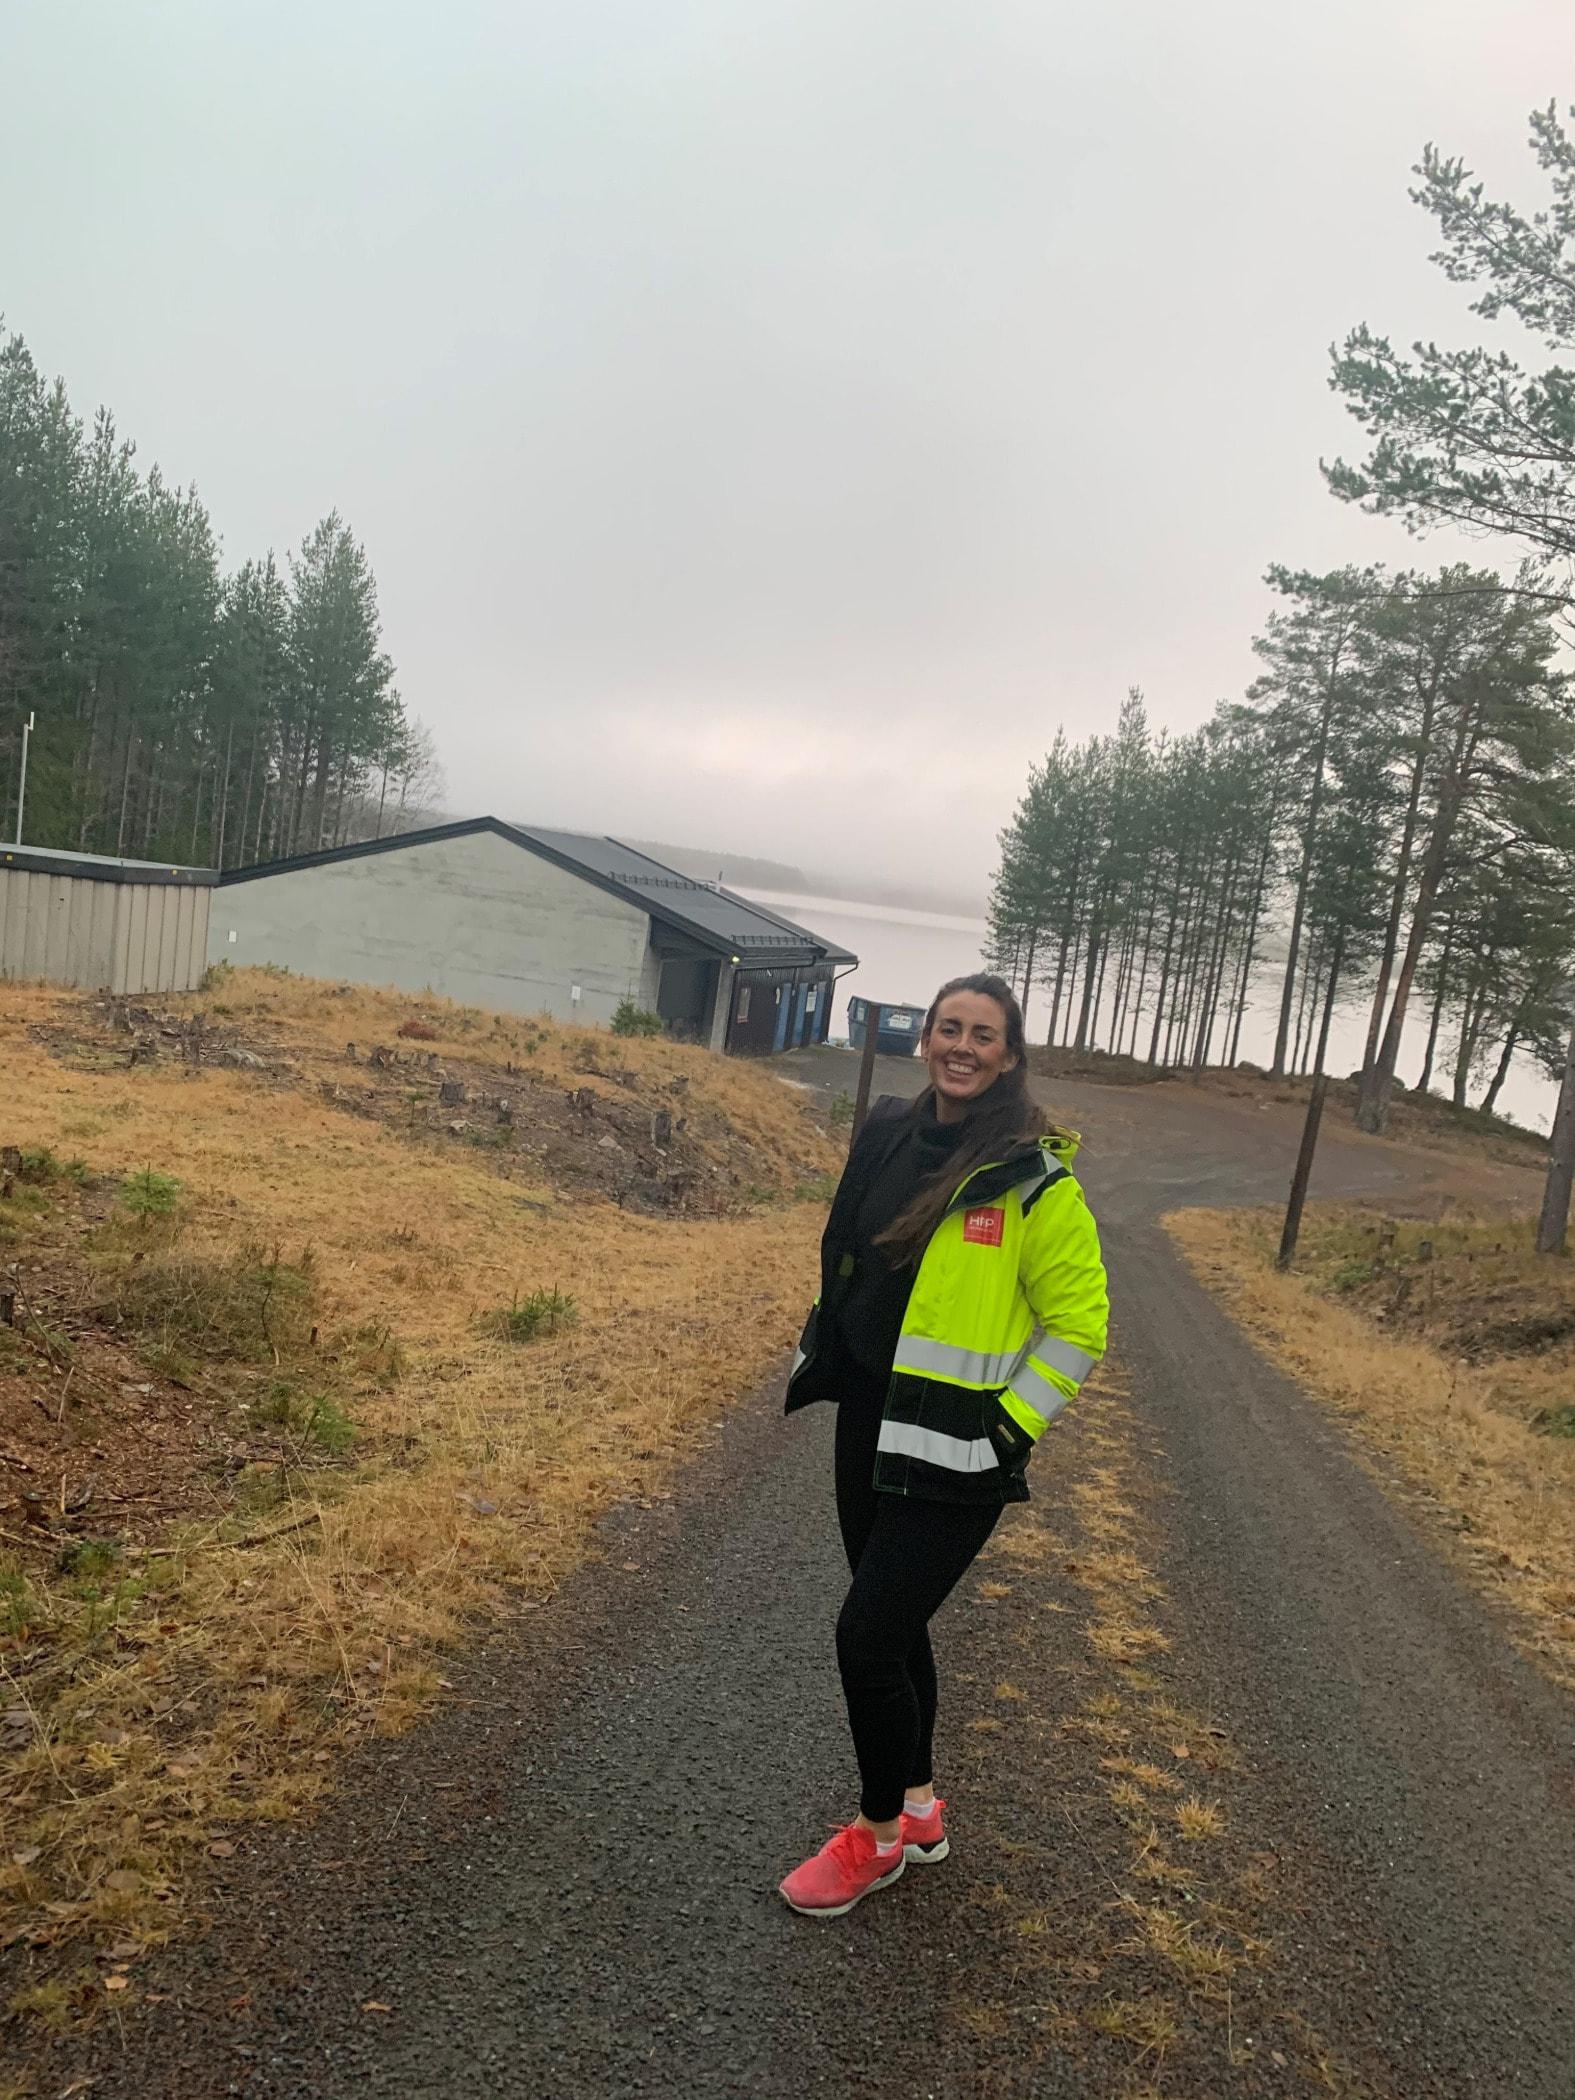 Long-distance running, Outdoor recreation, Atmospheric phenomenon, Morning, Road, Jogging, Sky, Ultramarathon